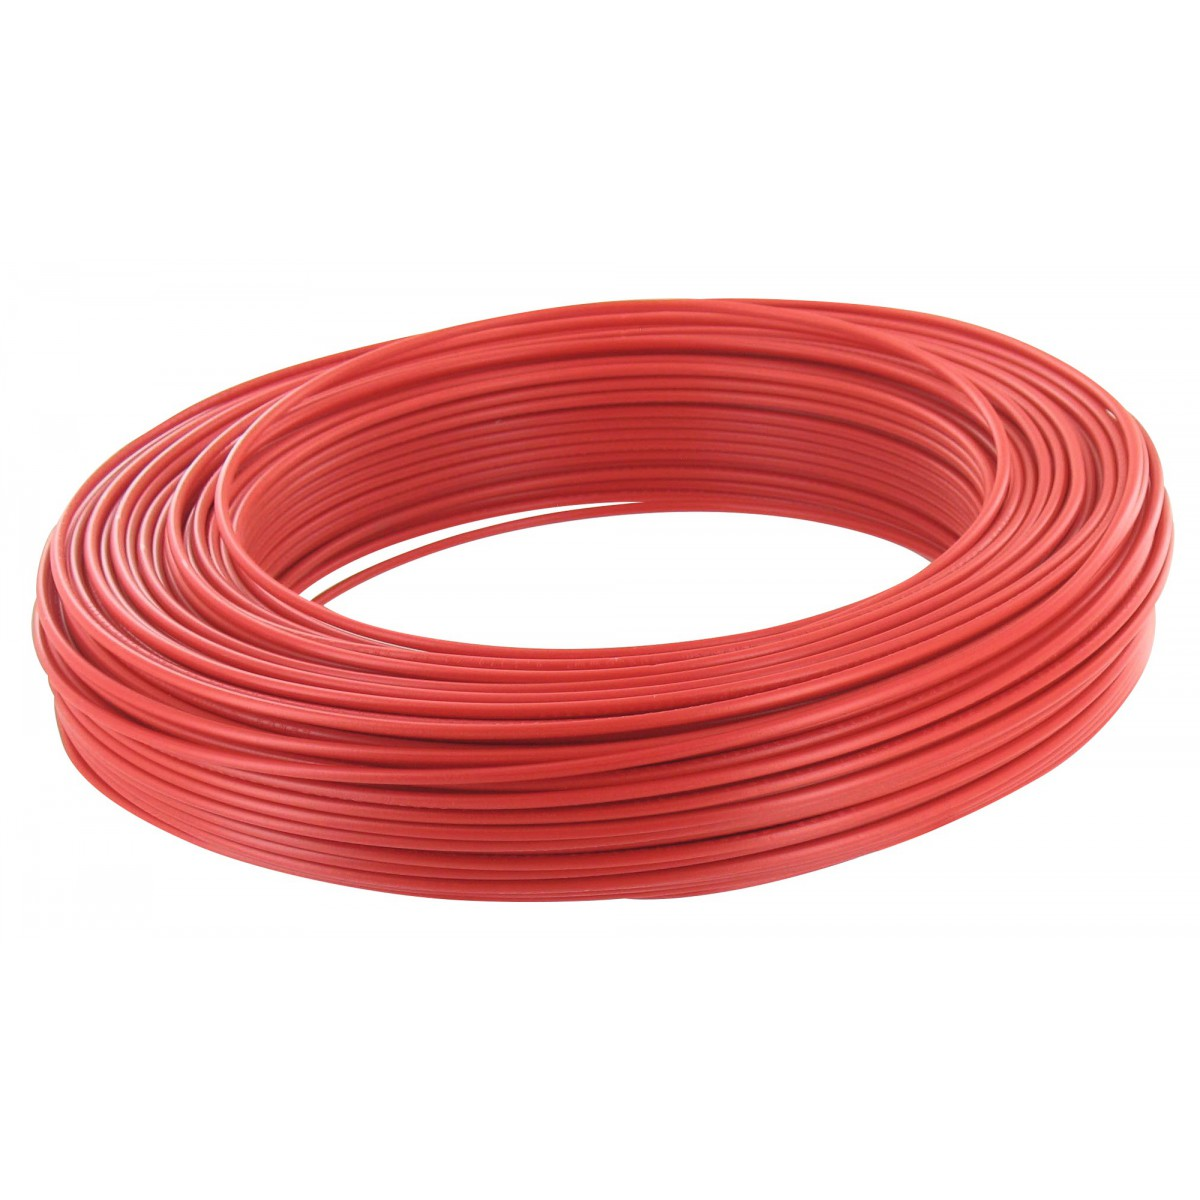 Fil H07 V-U 2,5 mm² - Couronne 100 m - Rouge